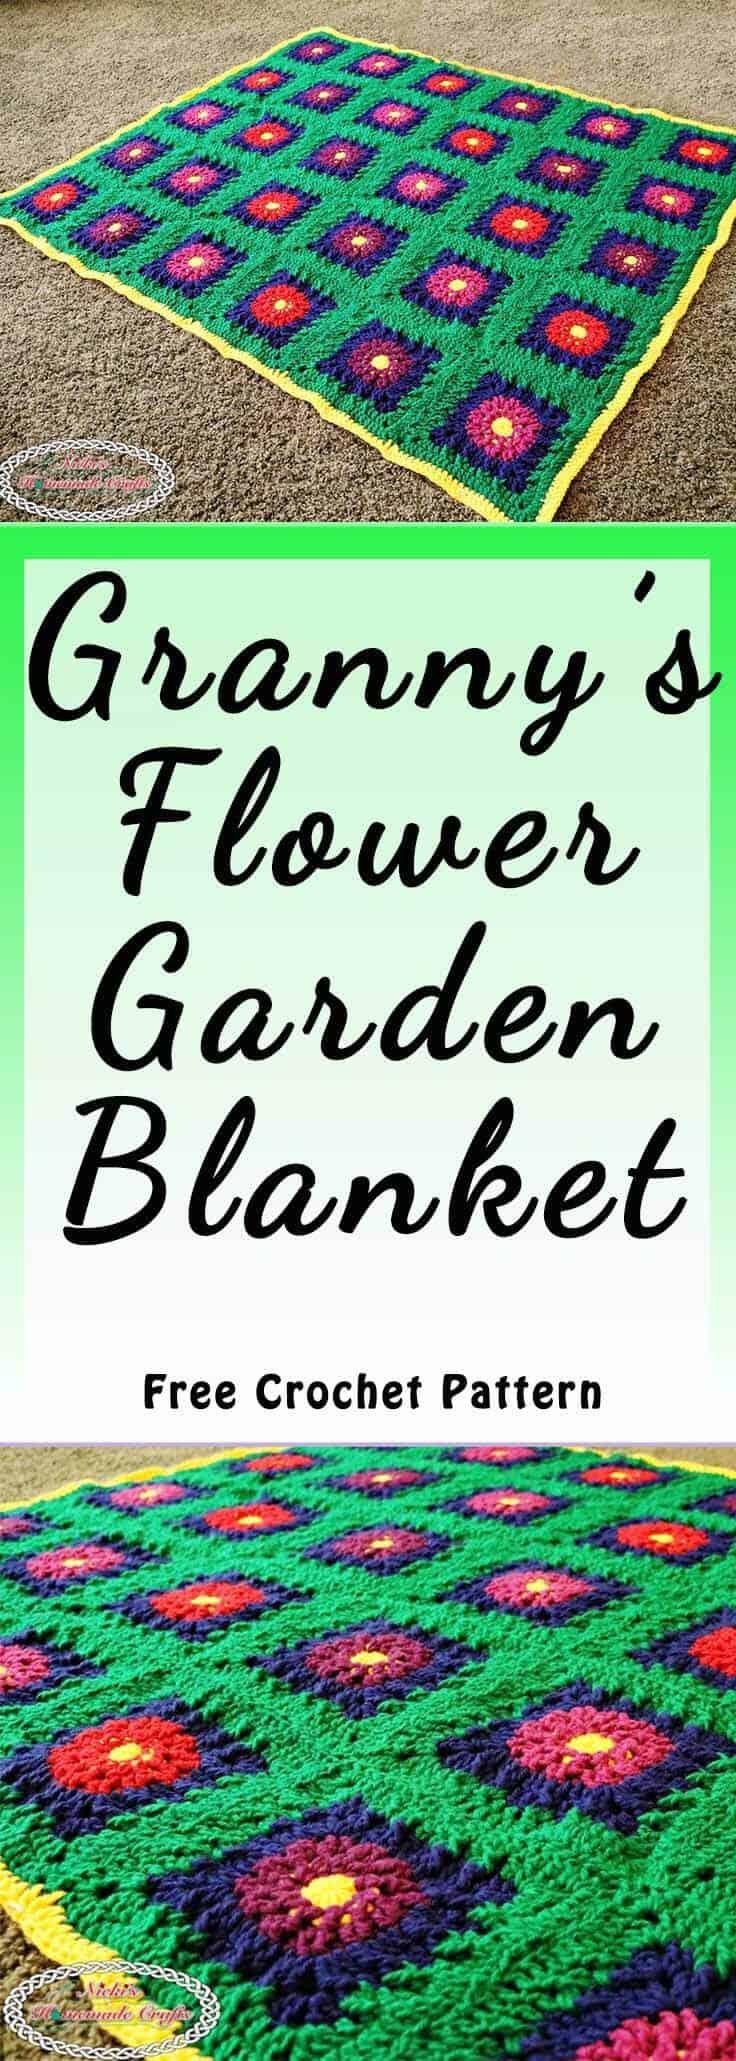 Crochet flower blanket with detailed free pattern